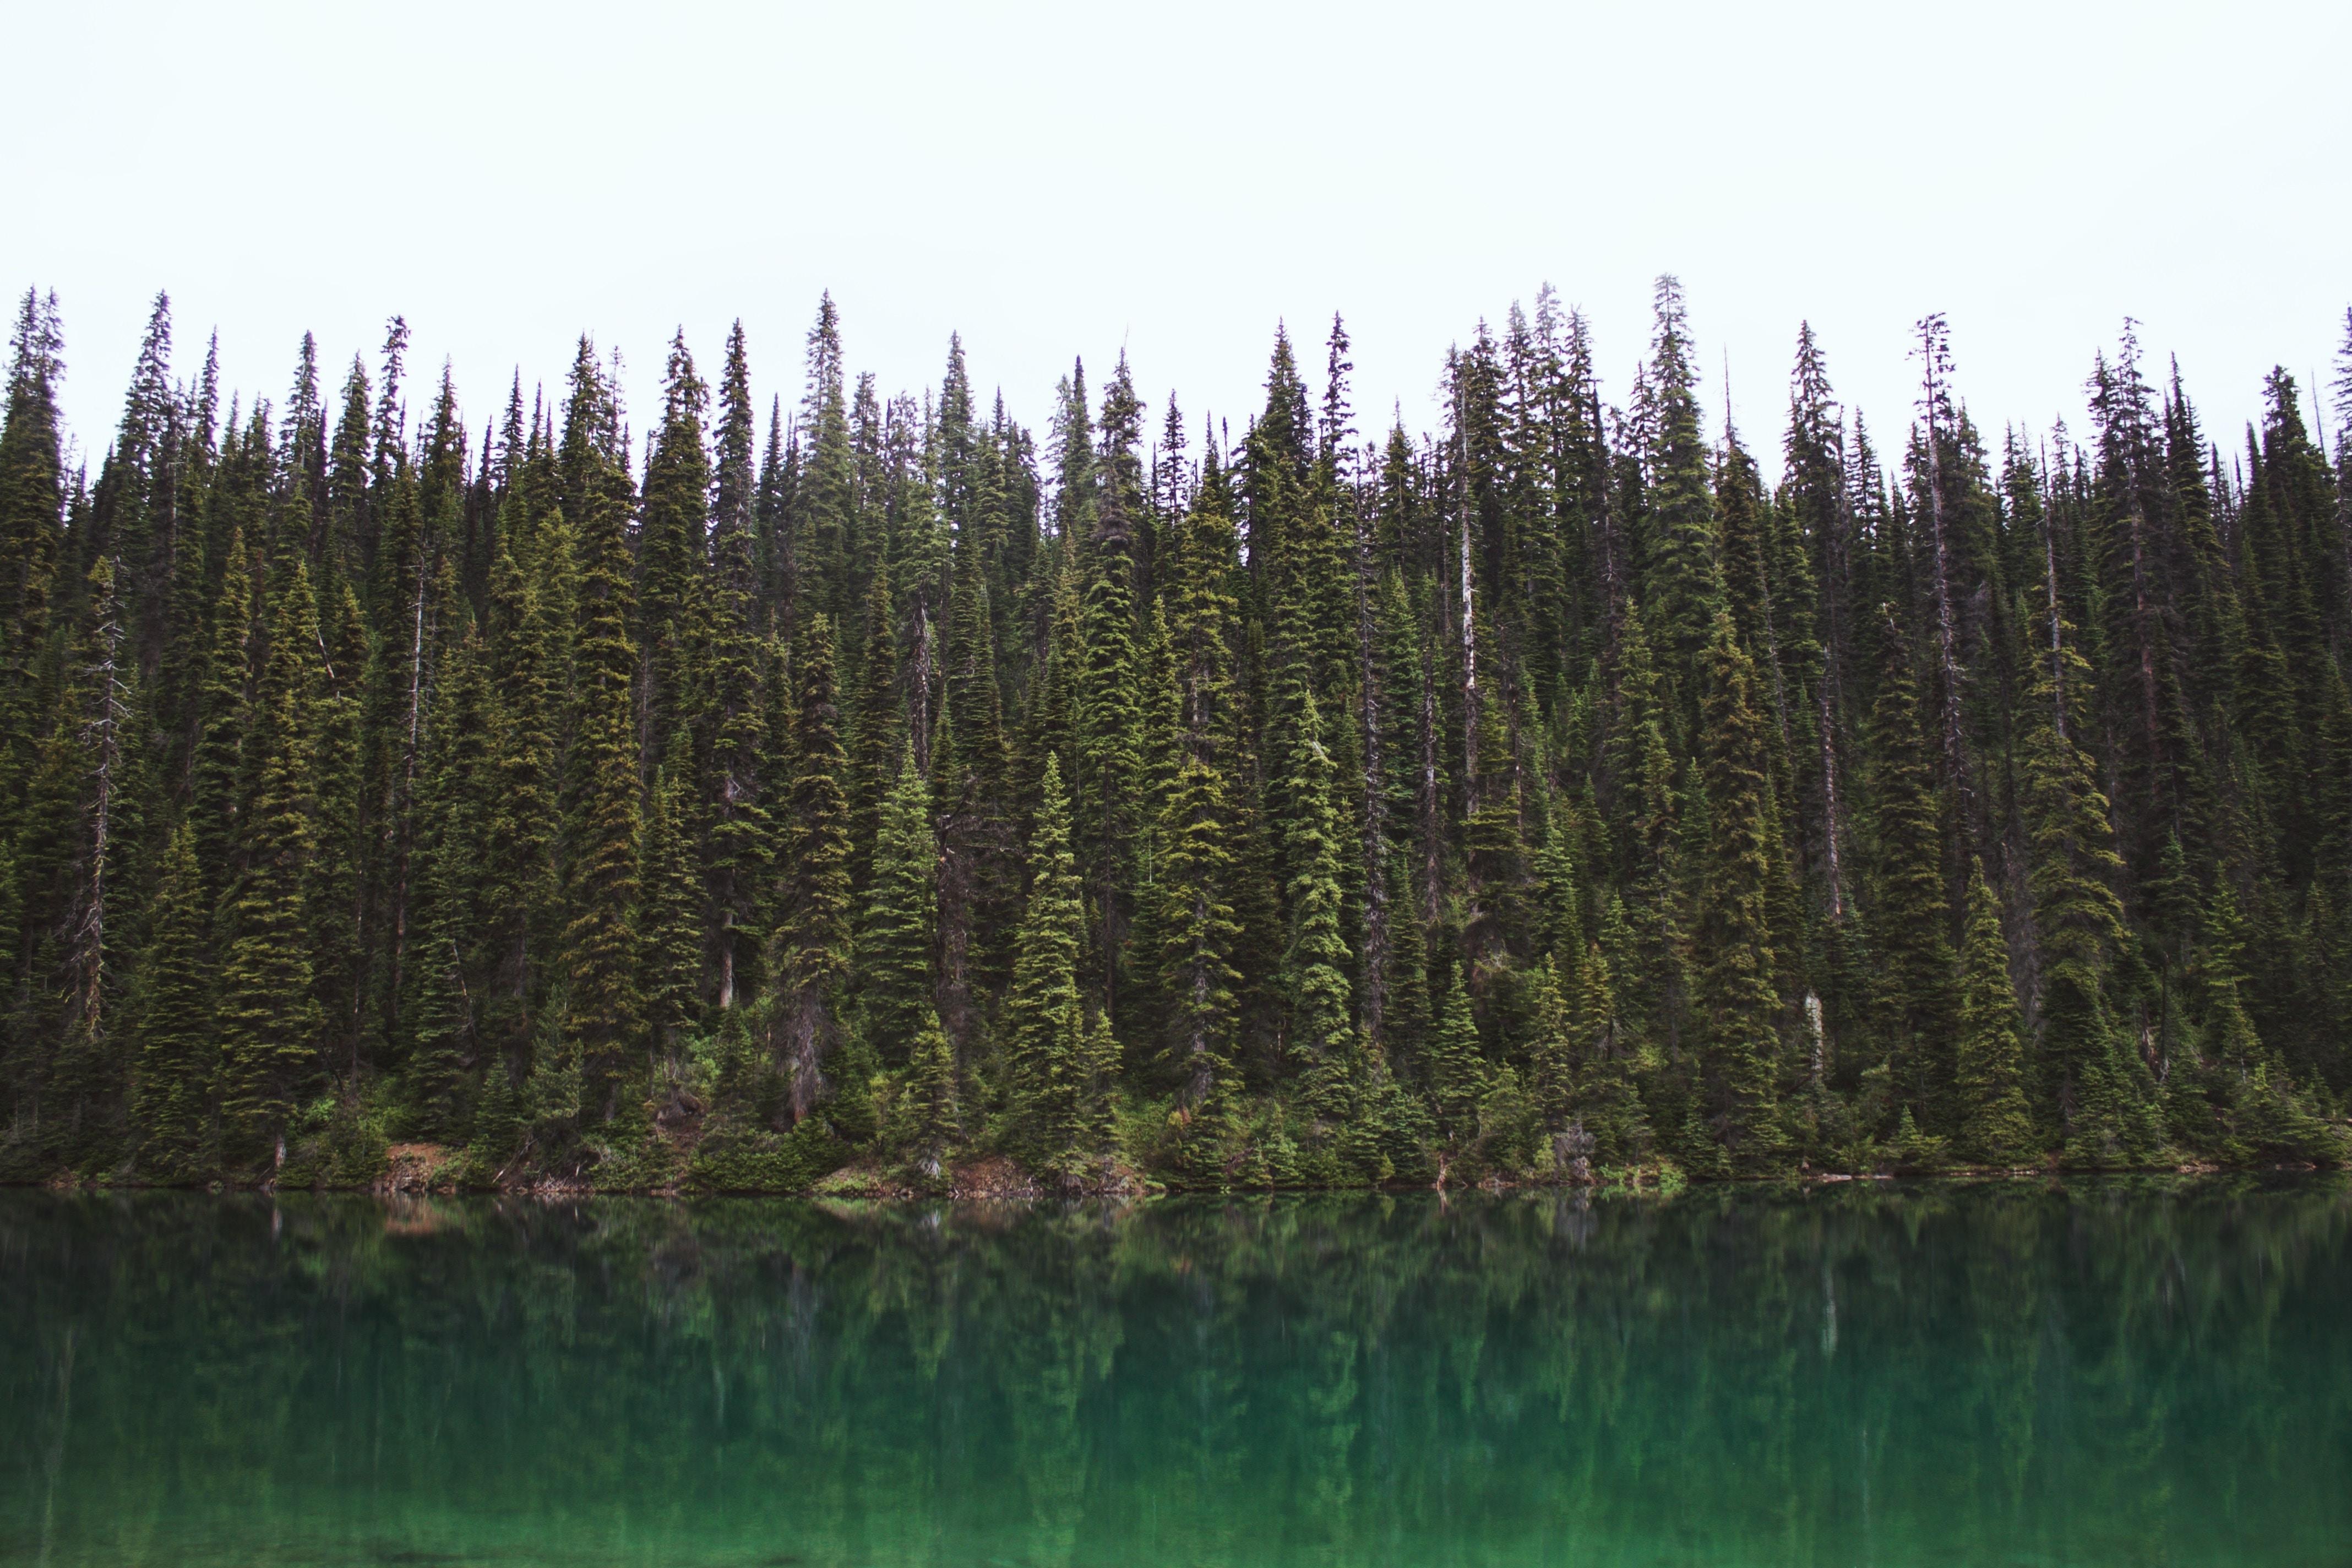 green pine trees beside body of water